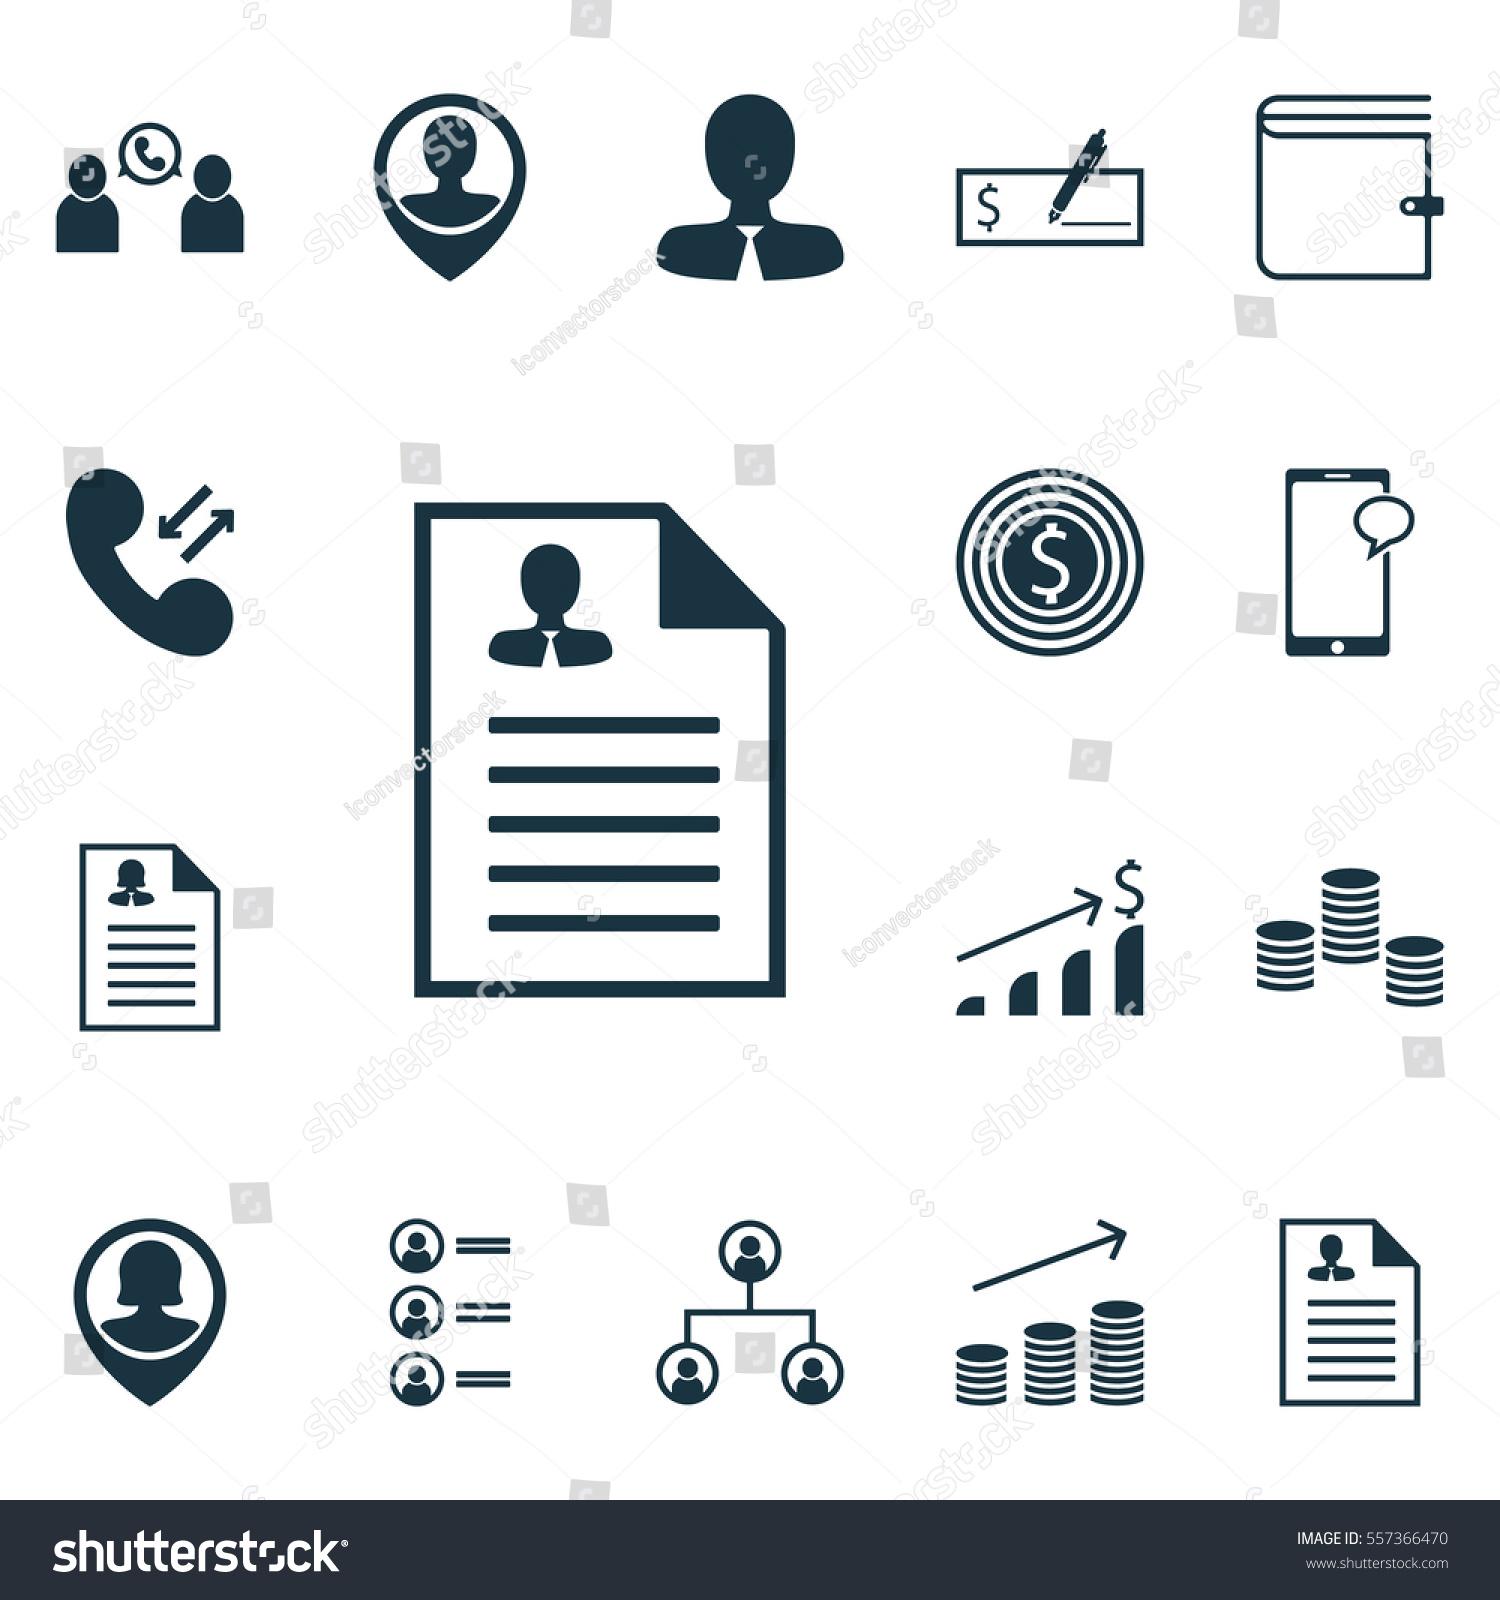 Set 16 Human Resources Icons Includes Vectores En Stock 557366470 ...